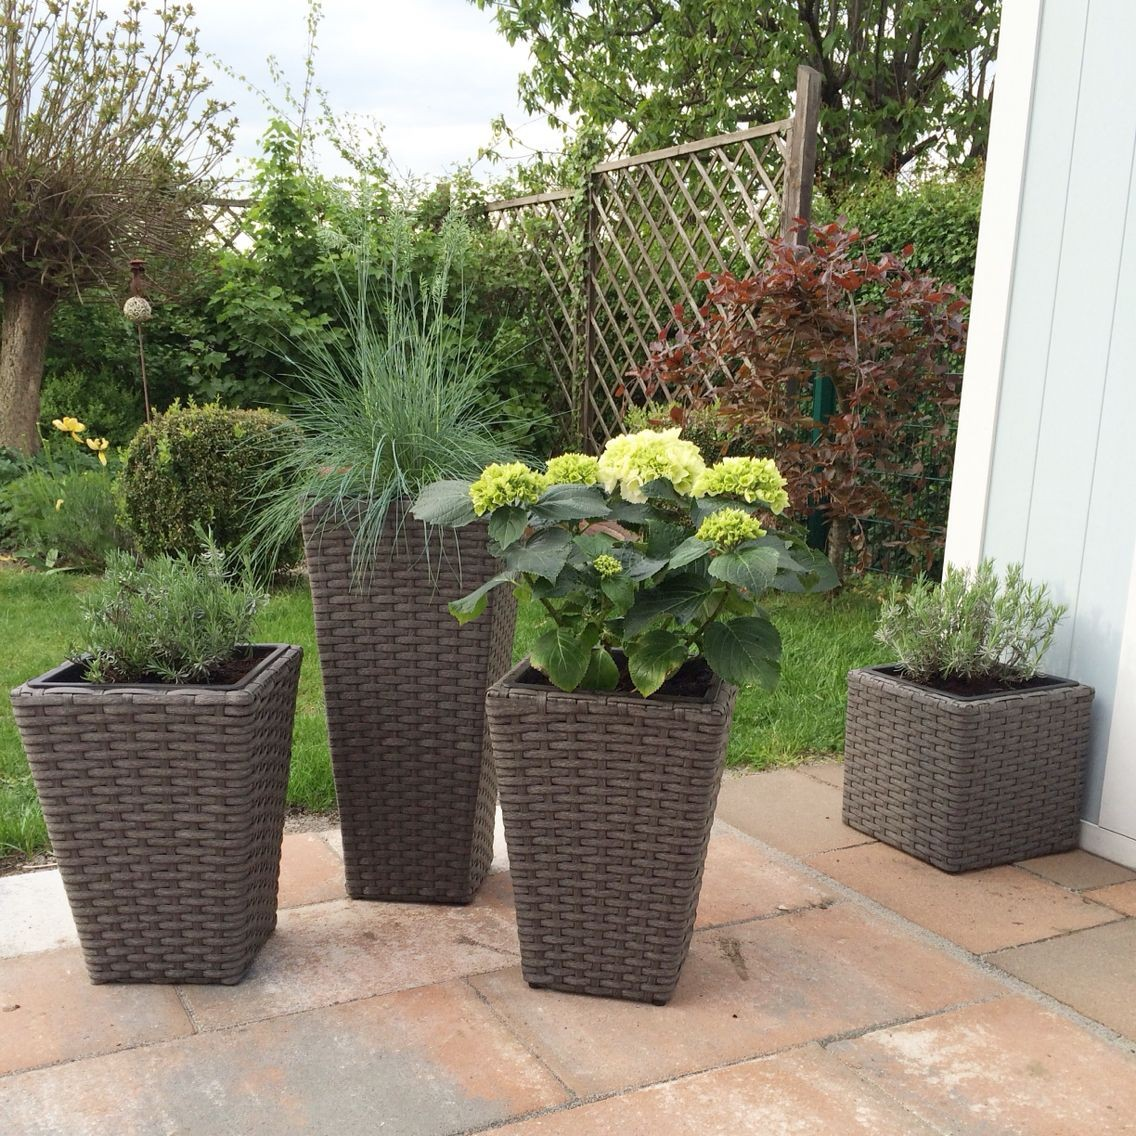 rattan kubel mit bepflanzung plant vase blumentopfe terrasse of blumentopfe terrasse